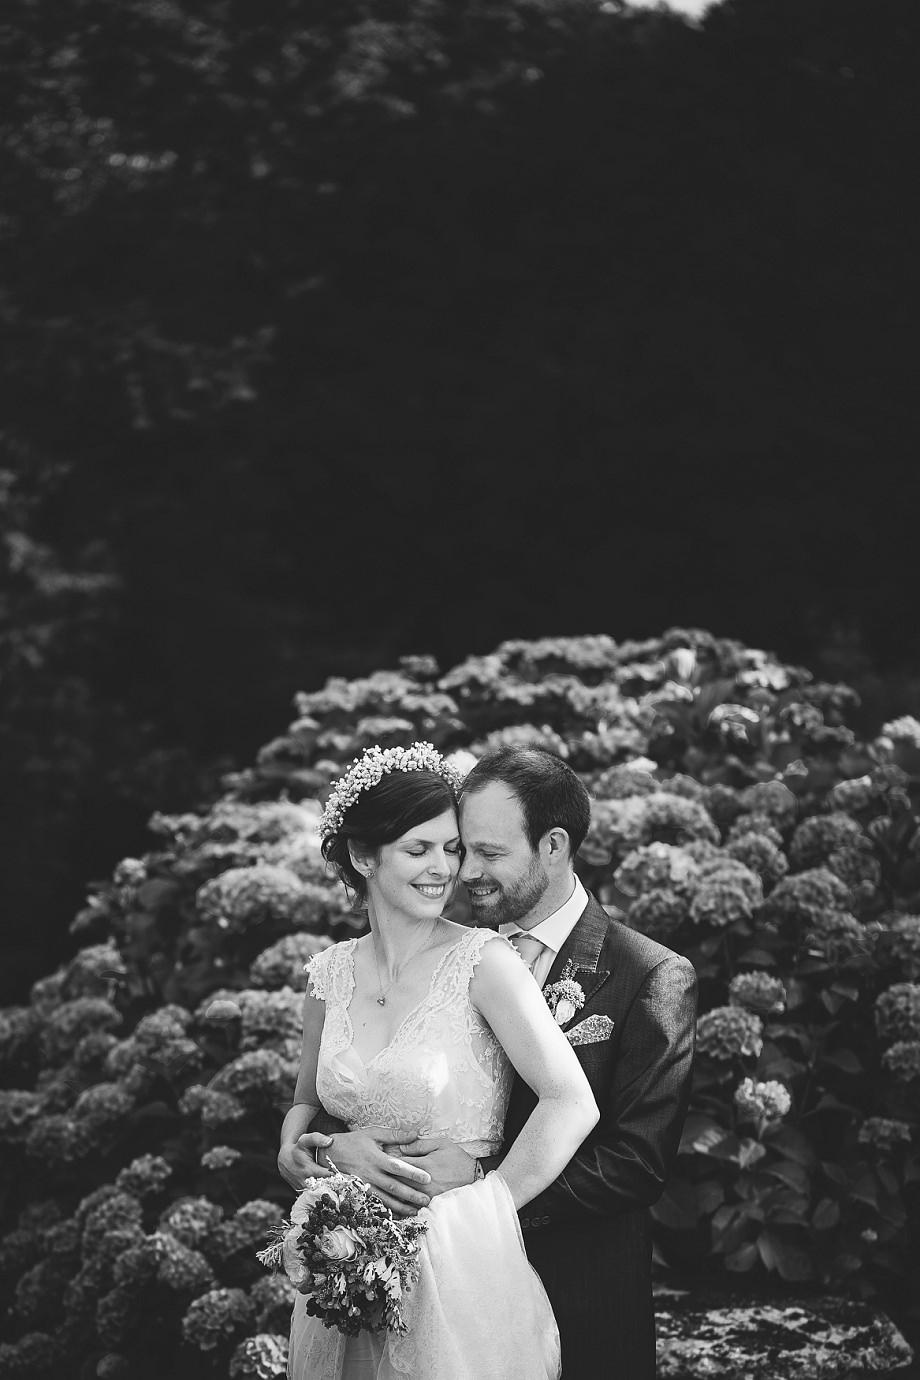 fine art wedding photography in glastonbury